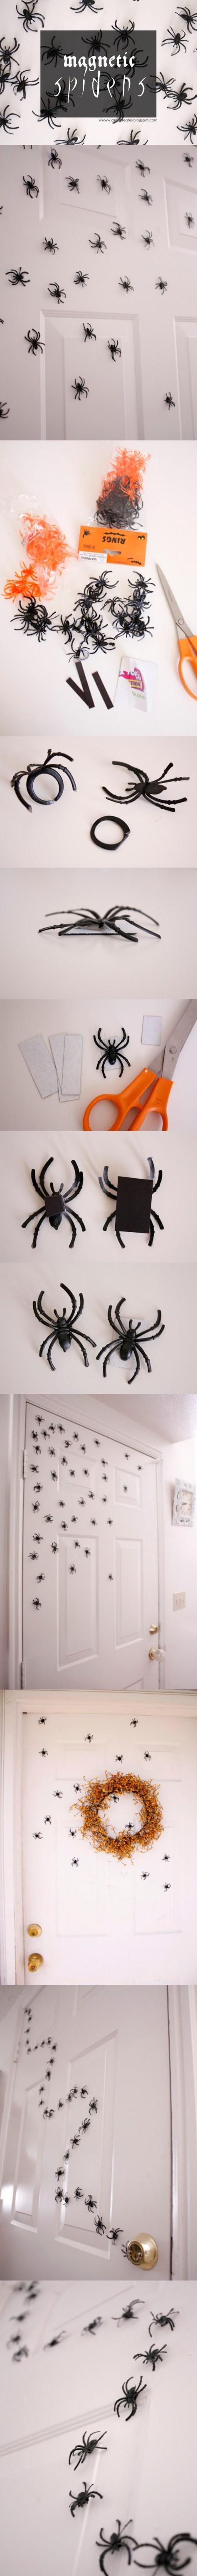 13. Halloween Magnetic Spiders